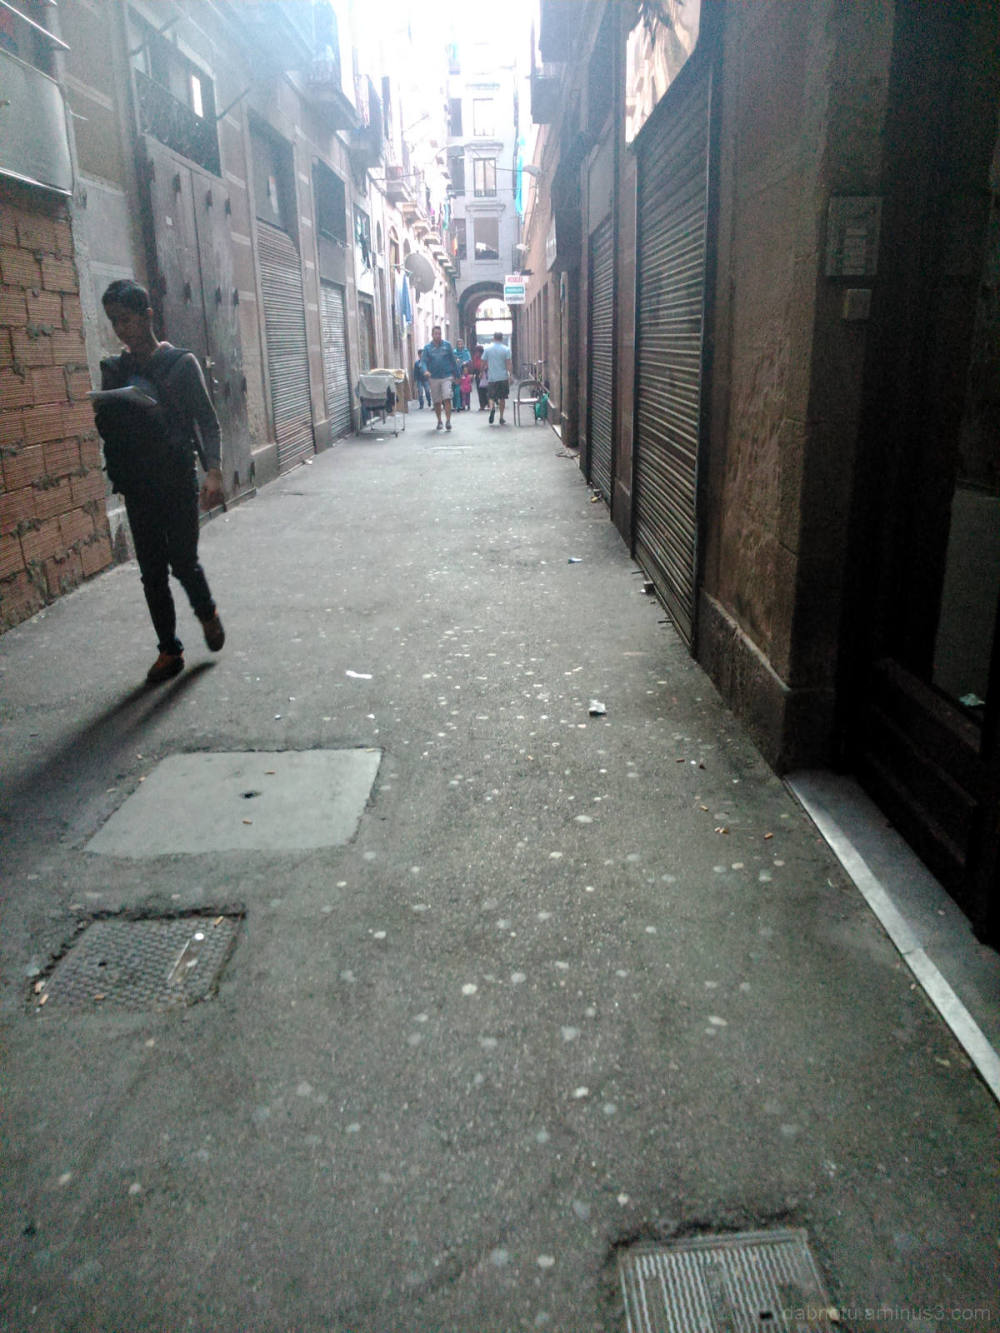 Barcelona street smartphone digital photography.